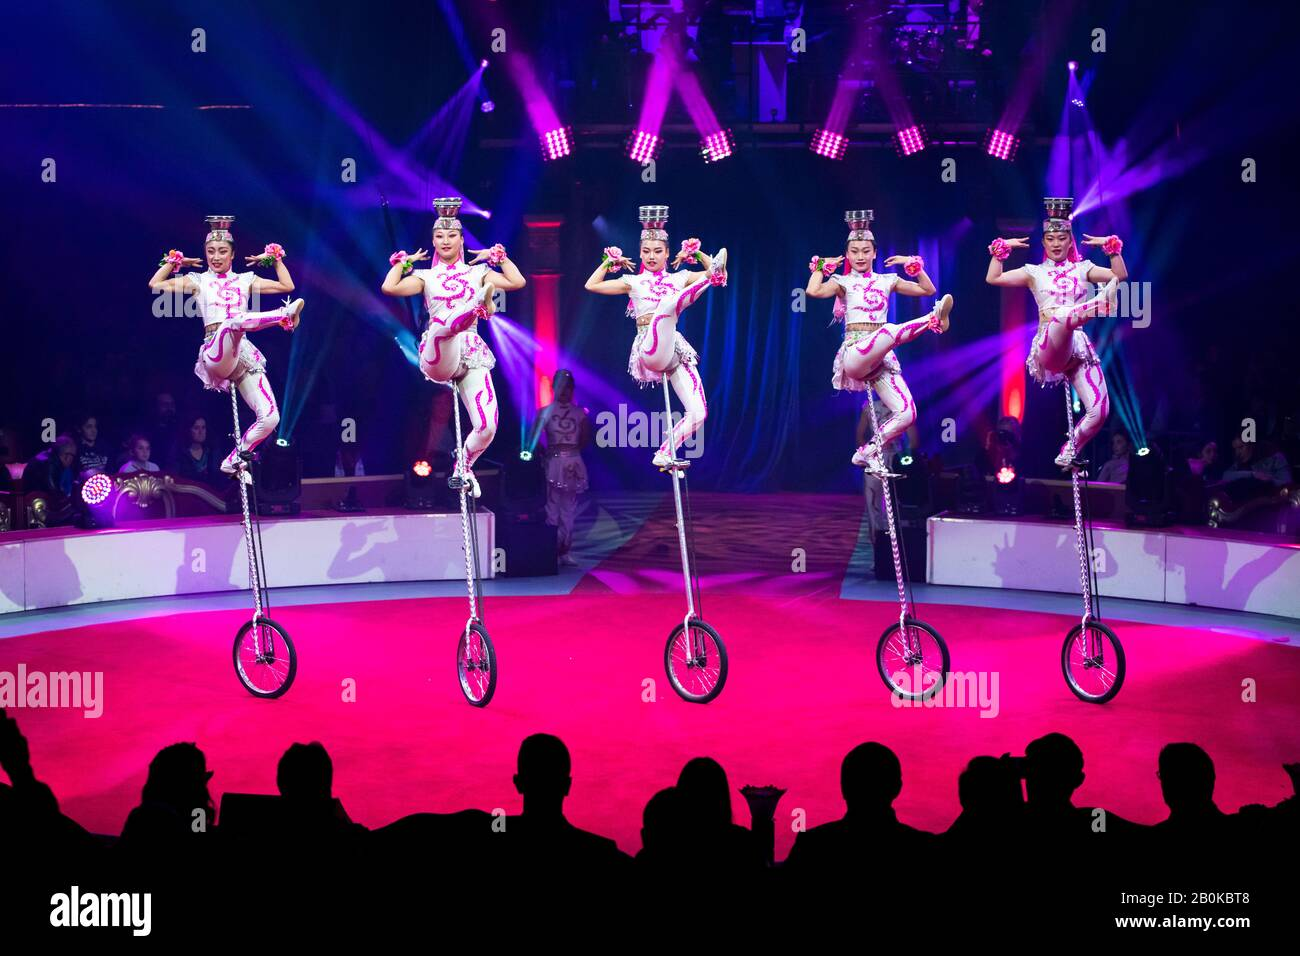 Girona, ESPAÑA - FEBRERO 17: La China Yinchuan acrobática de China realiza uniciclos durante el Festival Internacional de Circo 'Elefant d'Or' en Parc Foto de stock